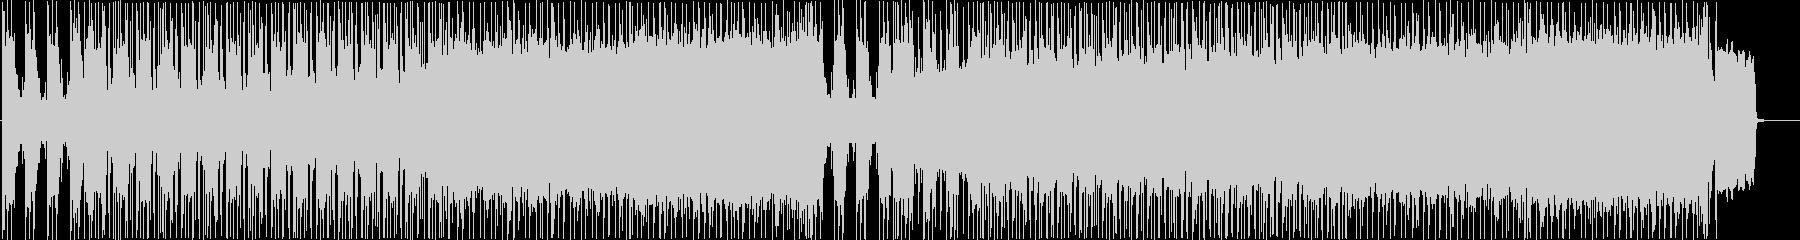 Metal BGM in the image of battle's unreproduced waveform